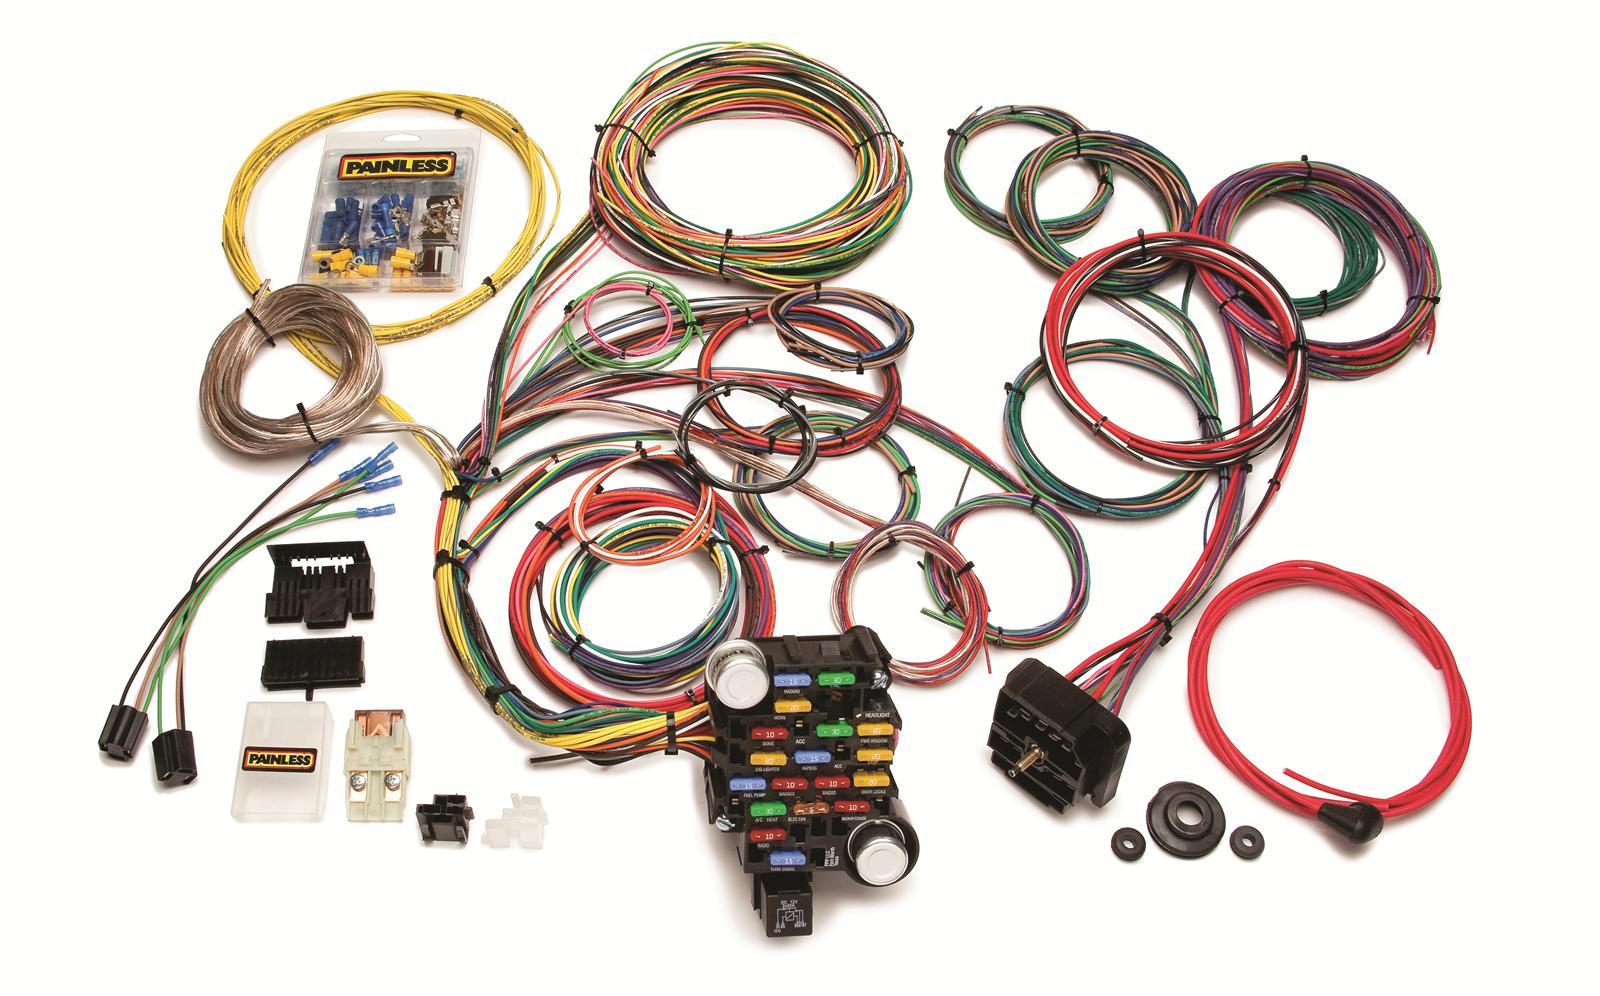 18 circuit wiring harness